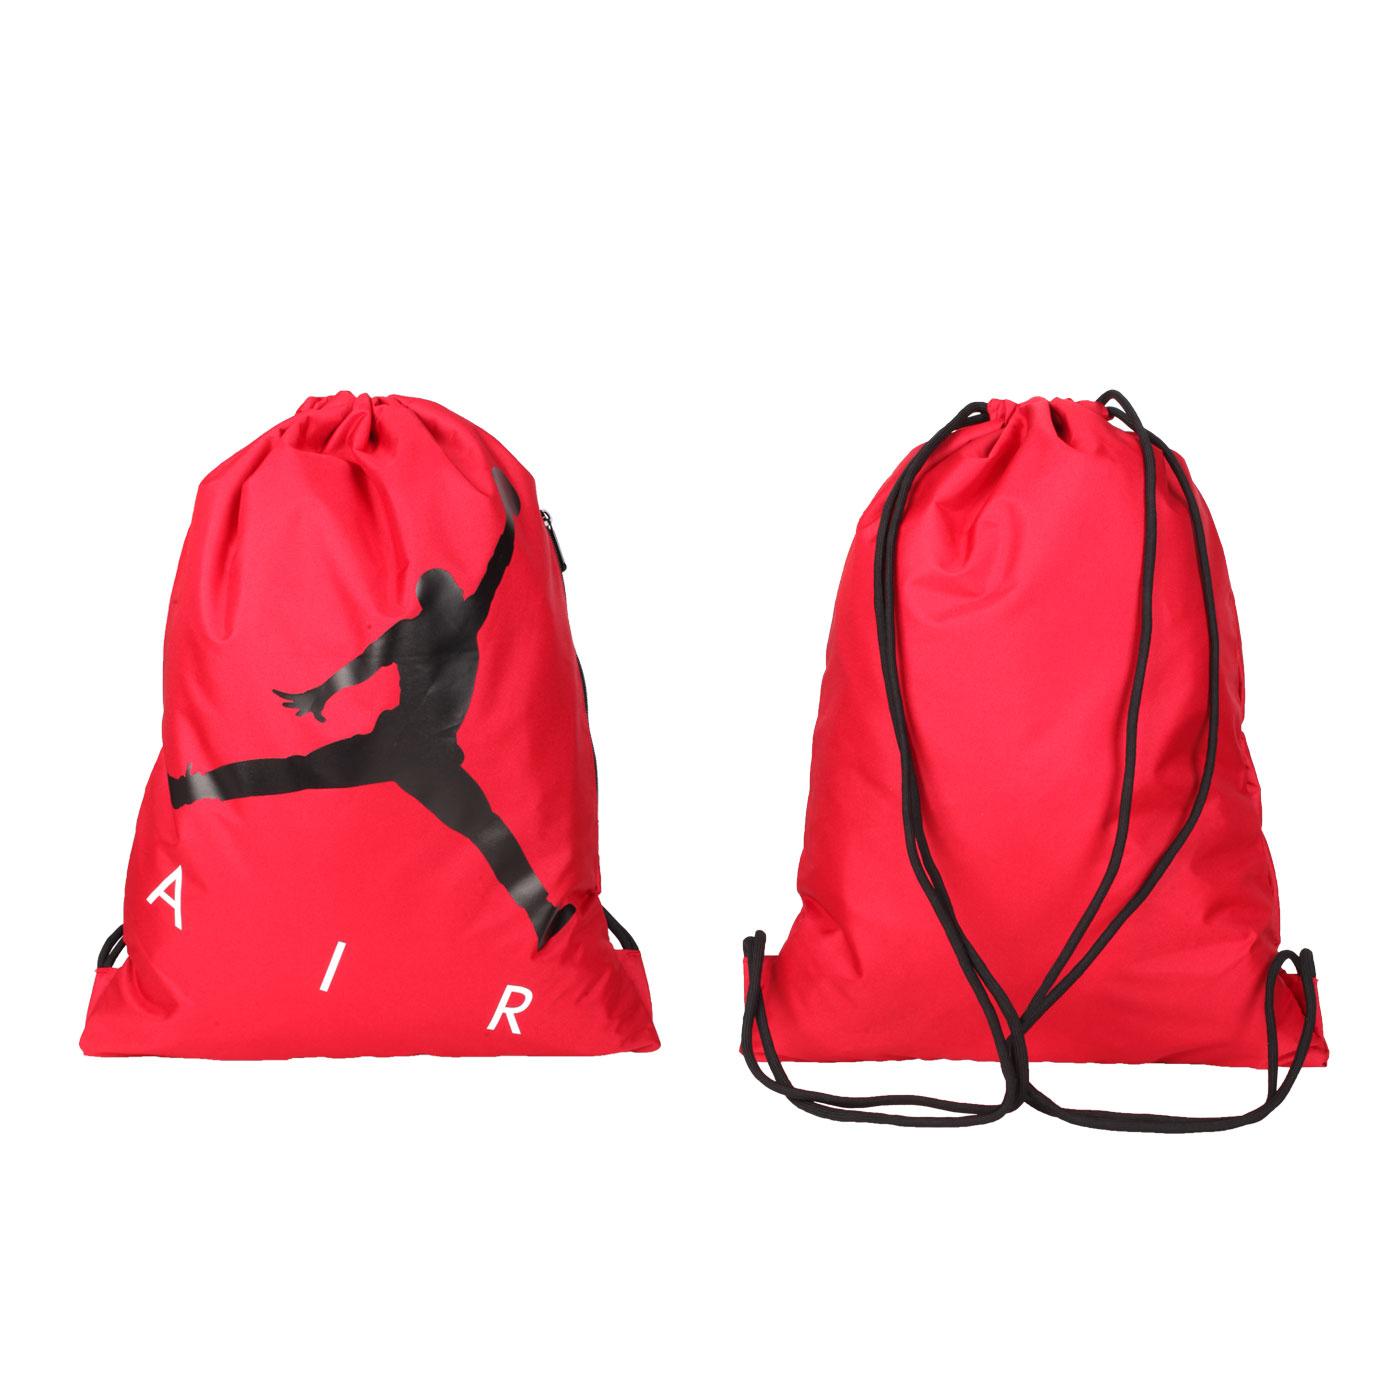 NIKE JORDAN 束口袋 JD2113040AD-002 - 紅黑白